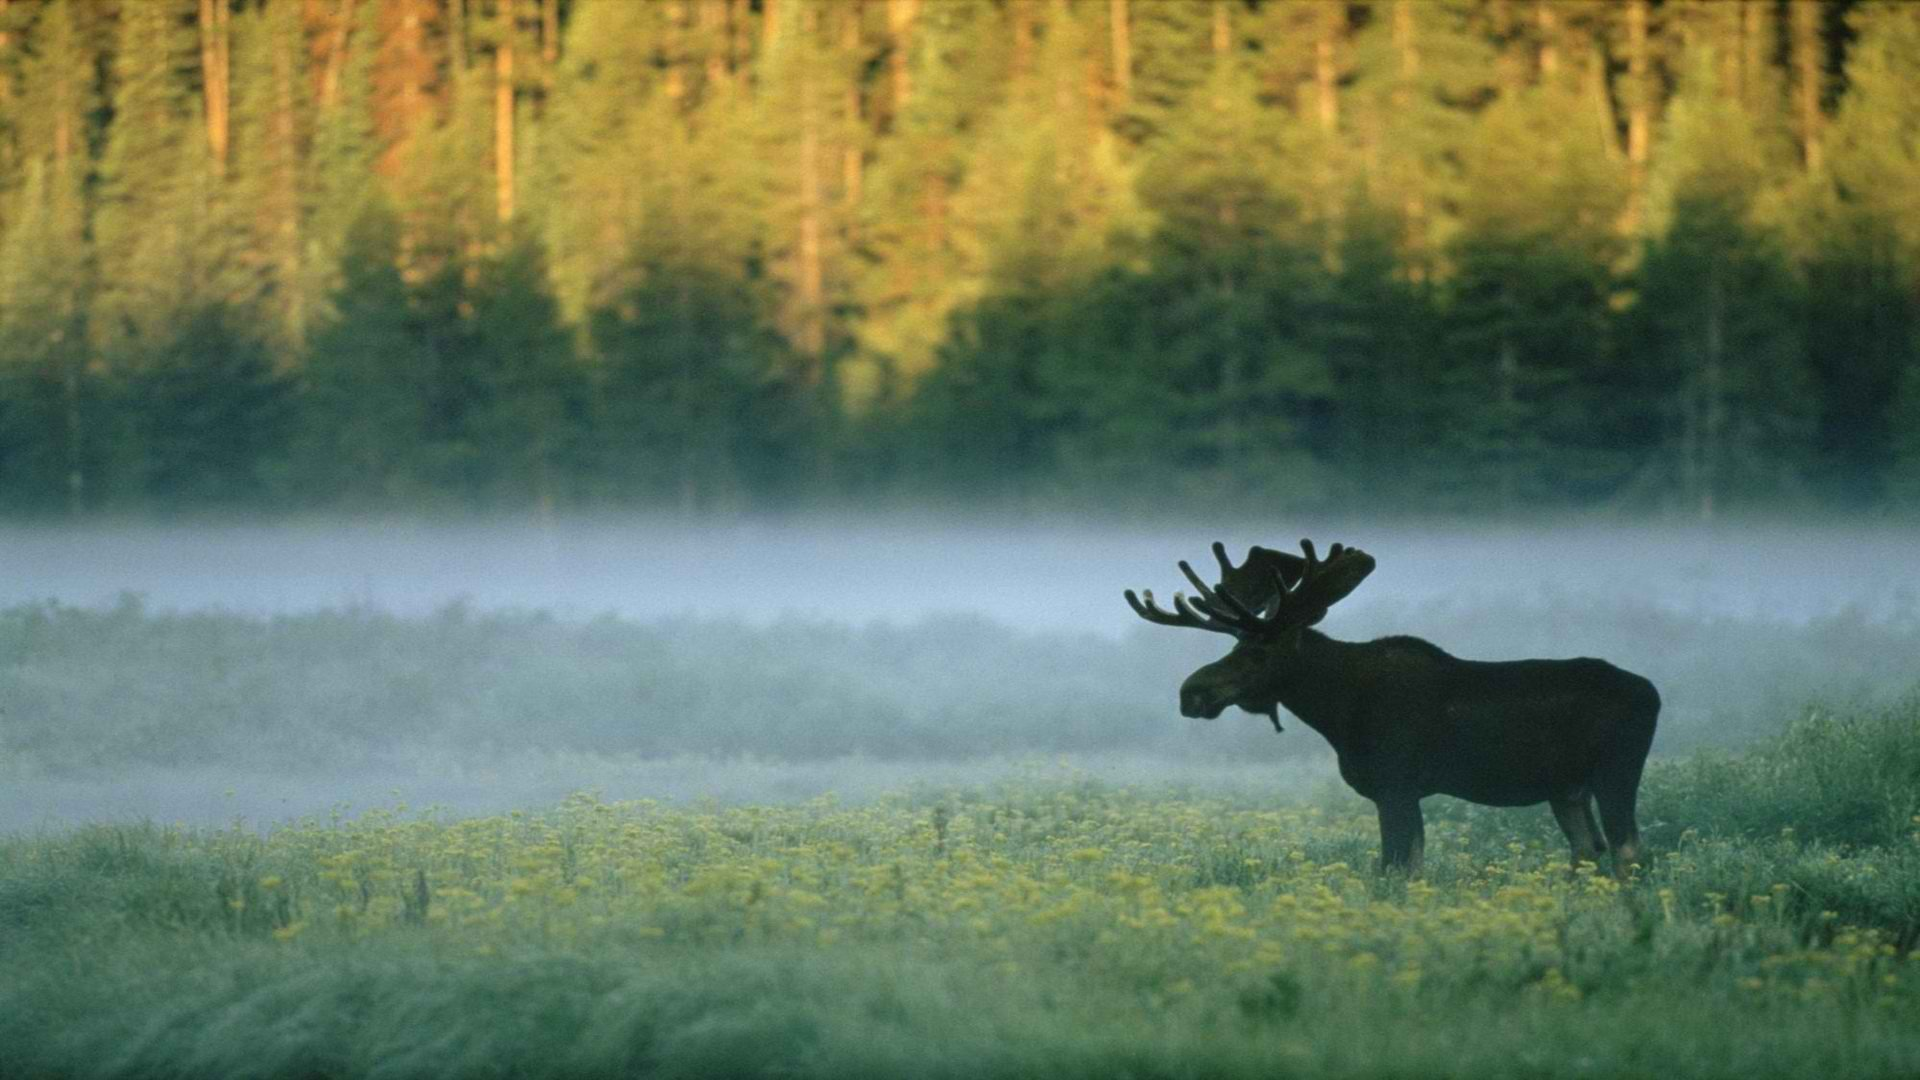 mist wyoming standing yellowstone national park wallpaper